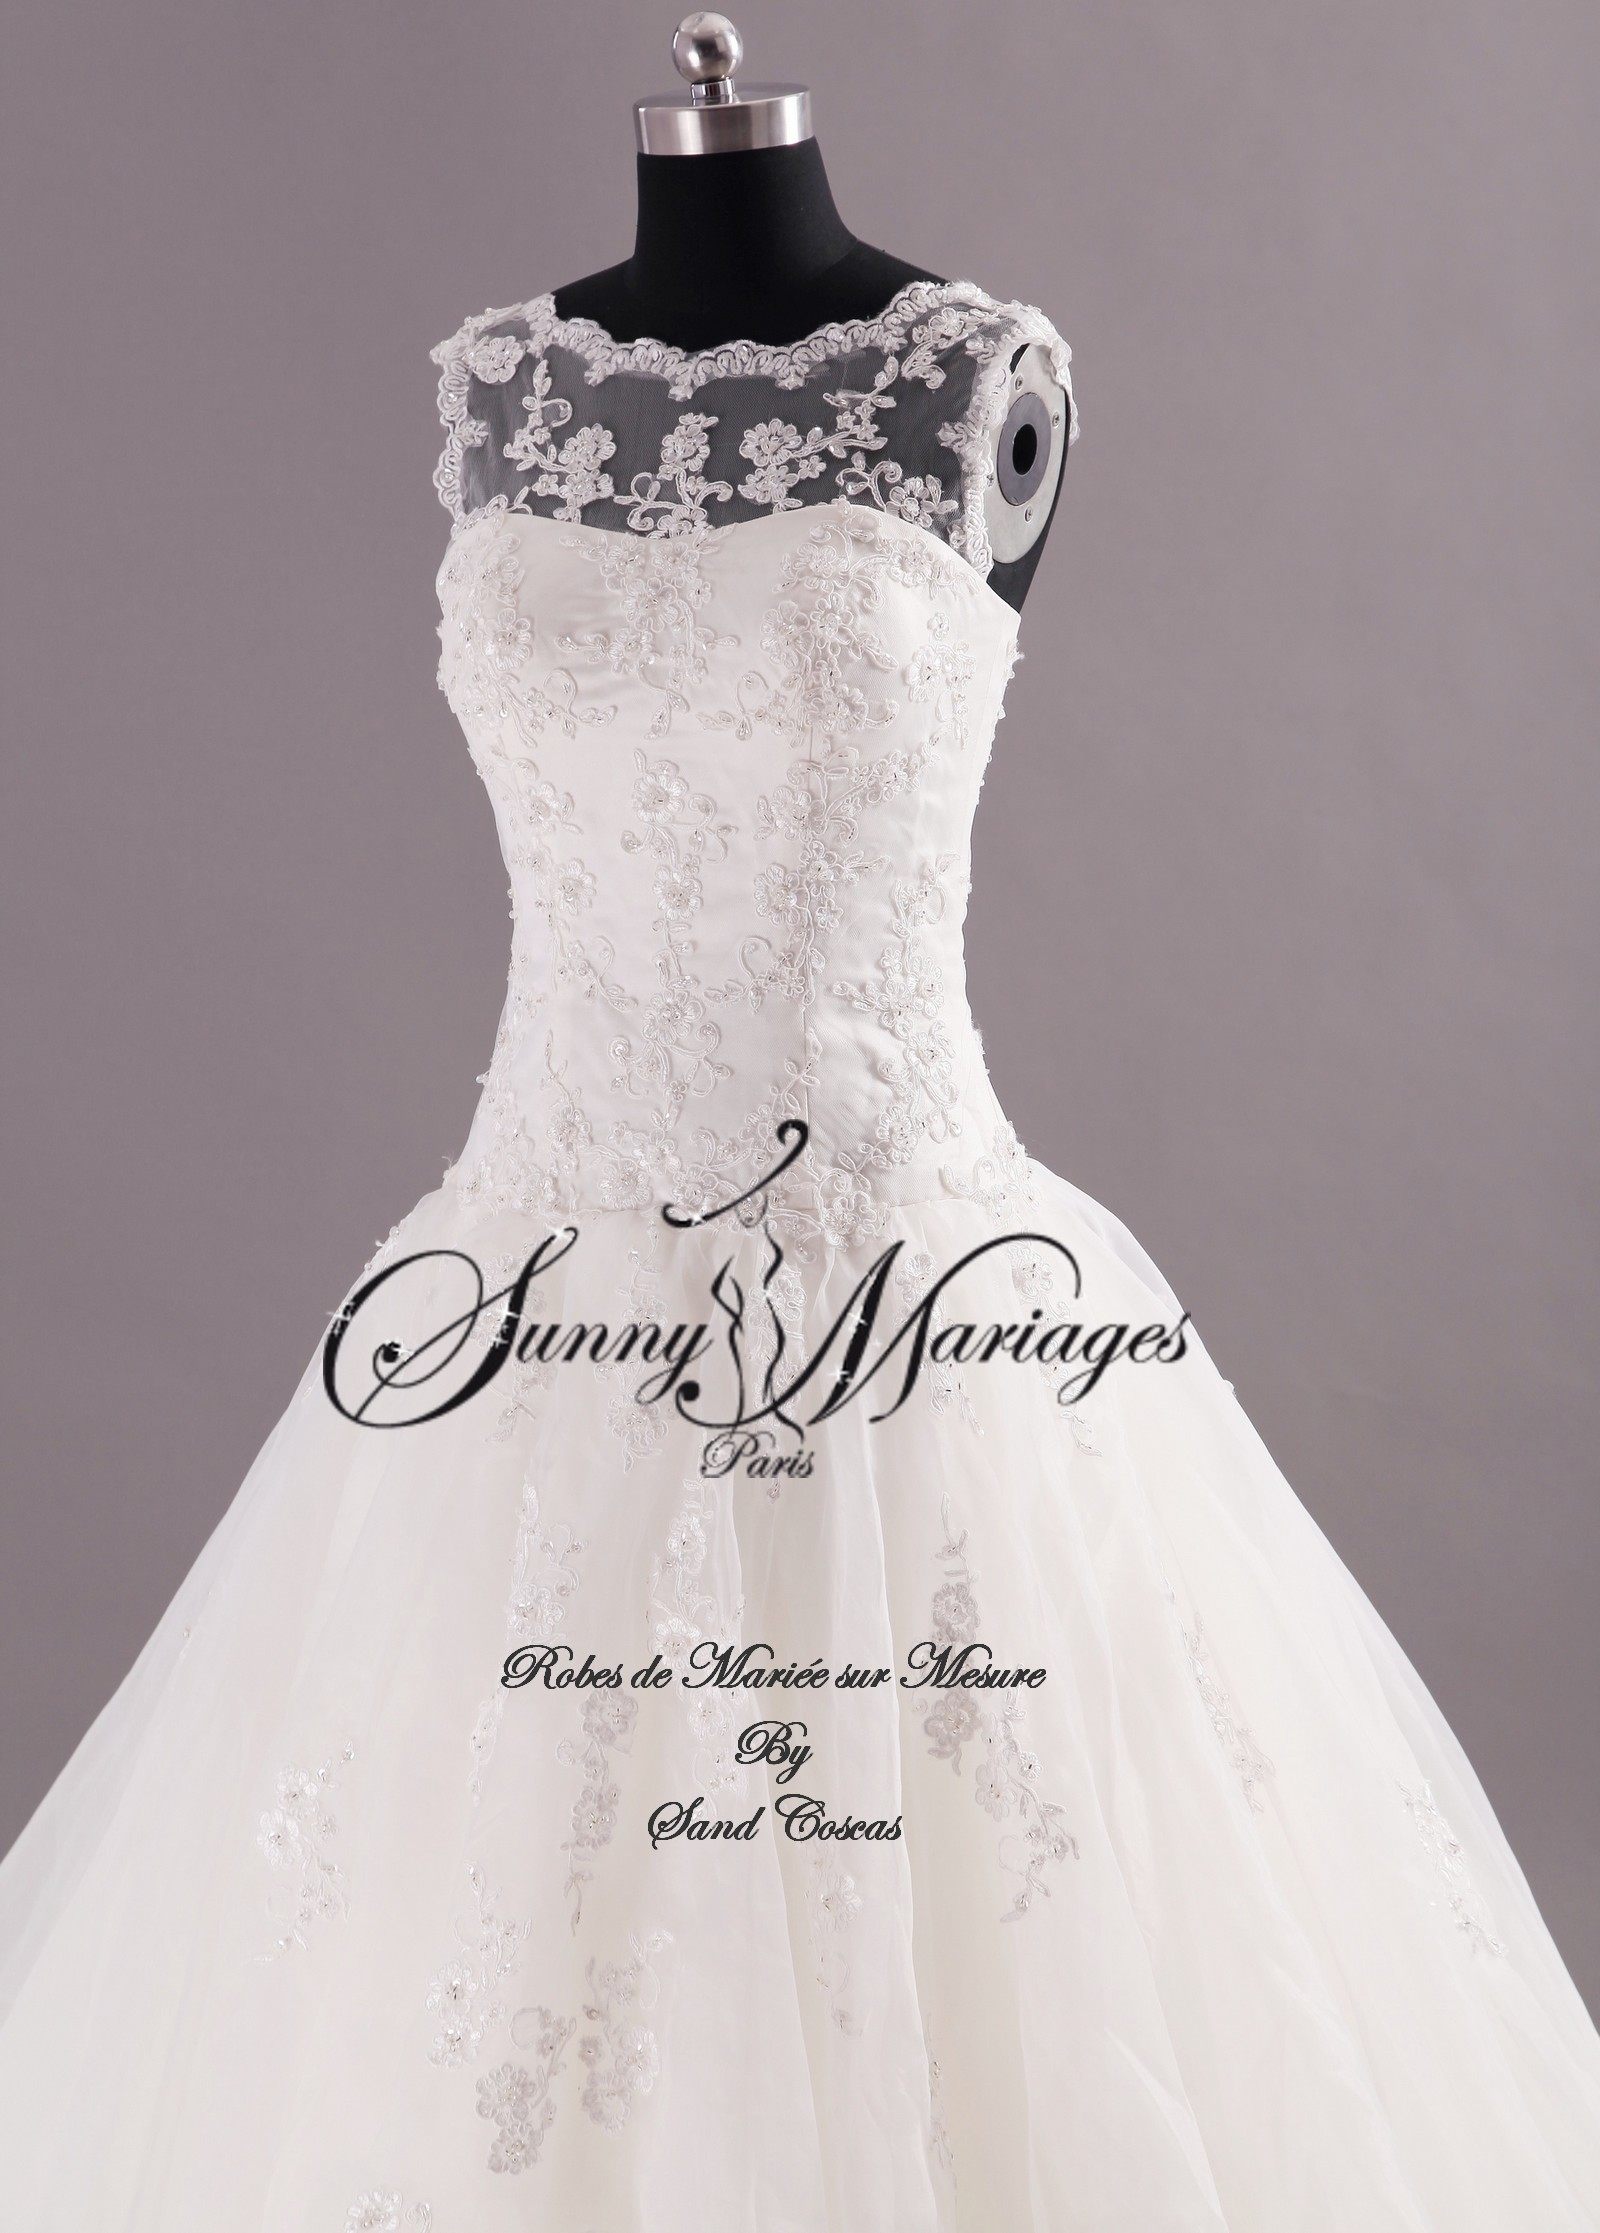 ... MARIAGES PARIS création robe de mariee 2014 2015  Sunny Mariage